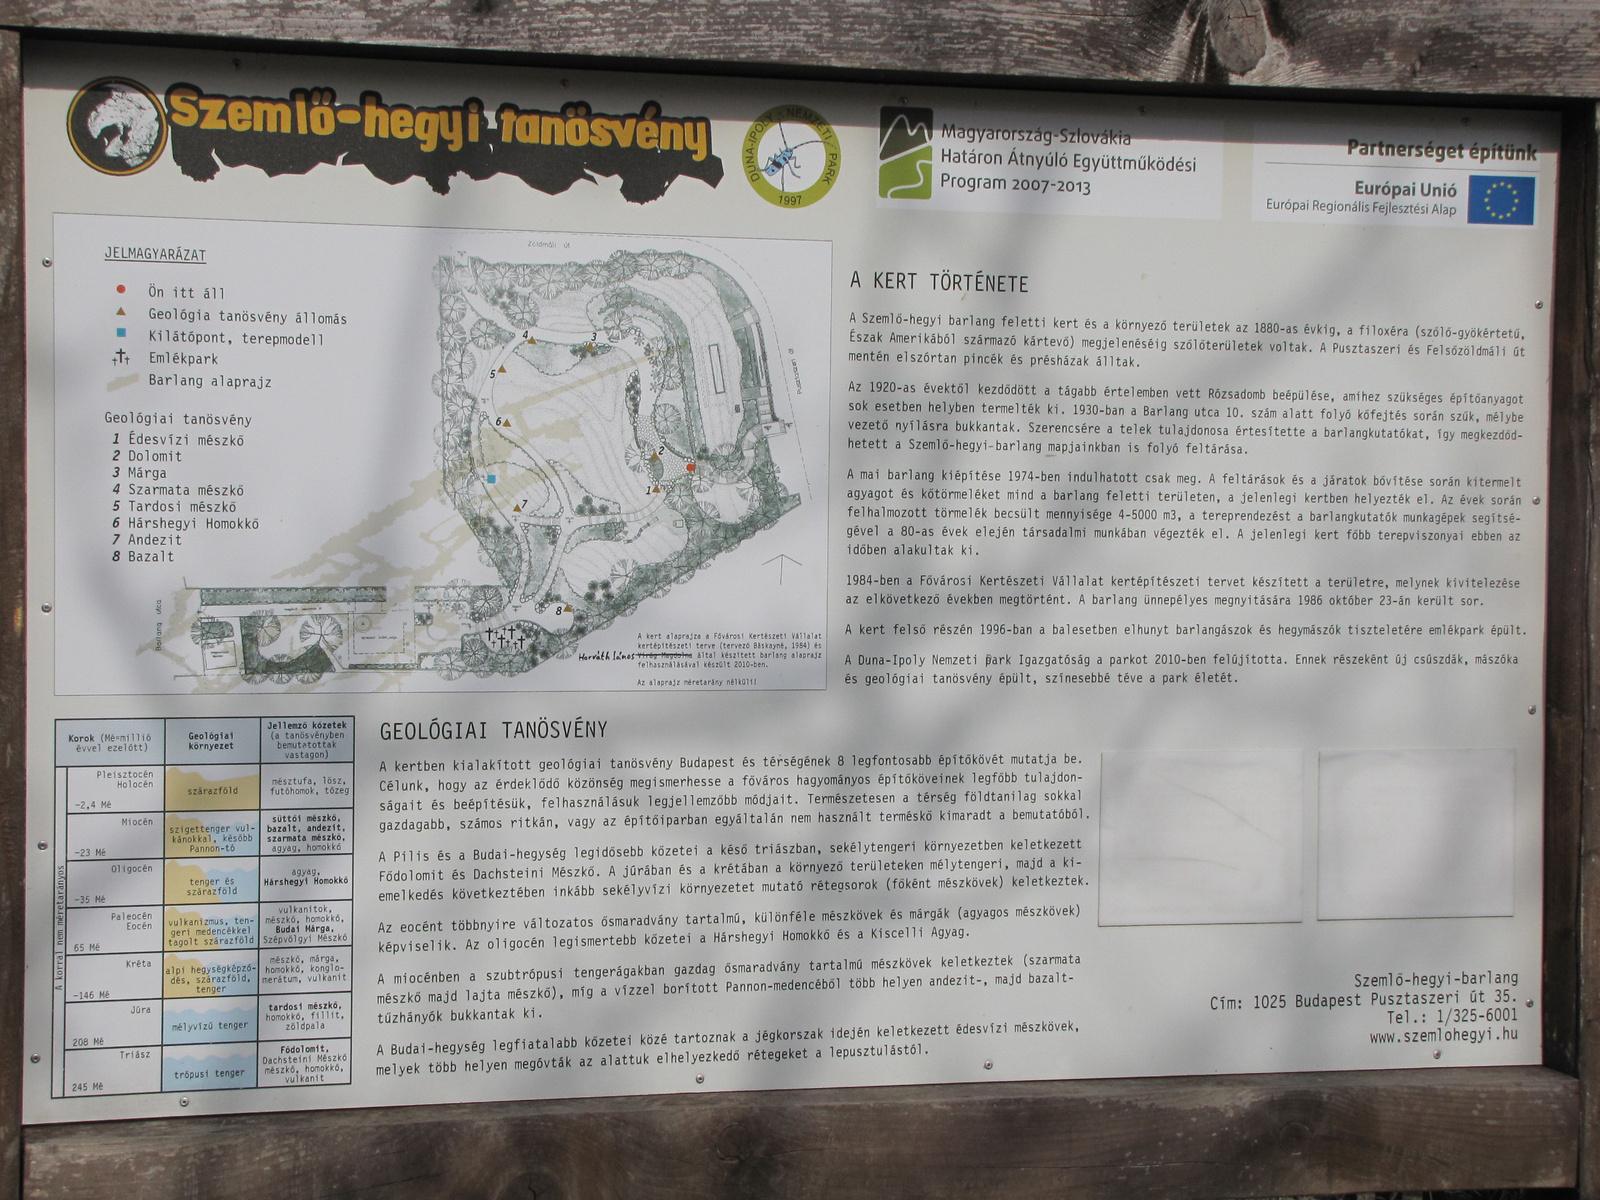 Magyarország, Budapest, Geológiai tanösvény, SzG3